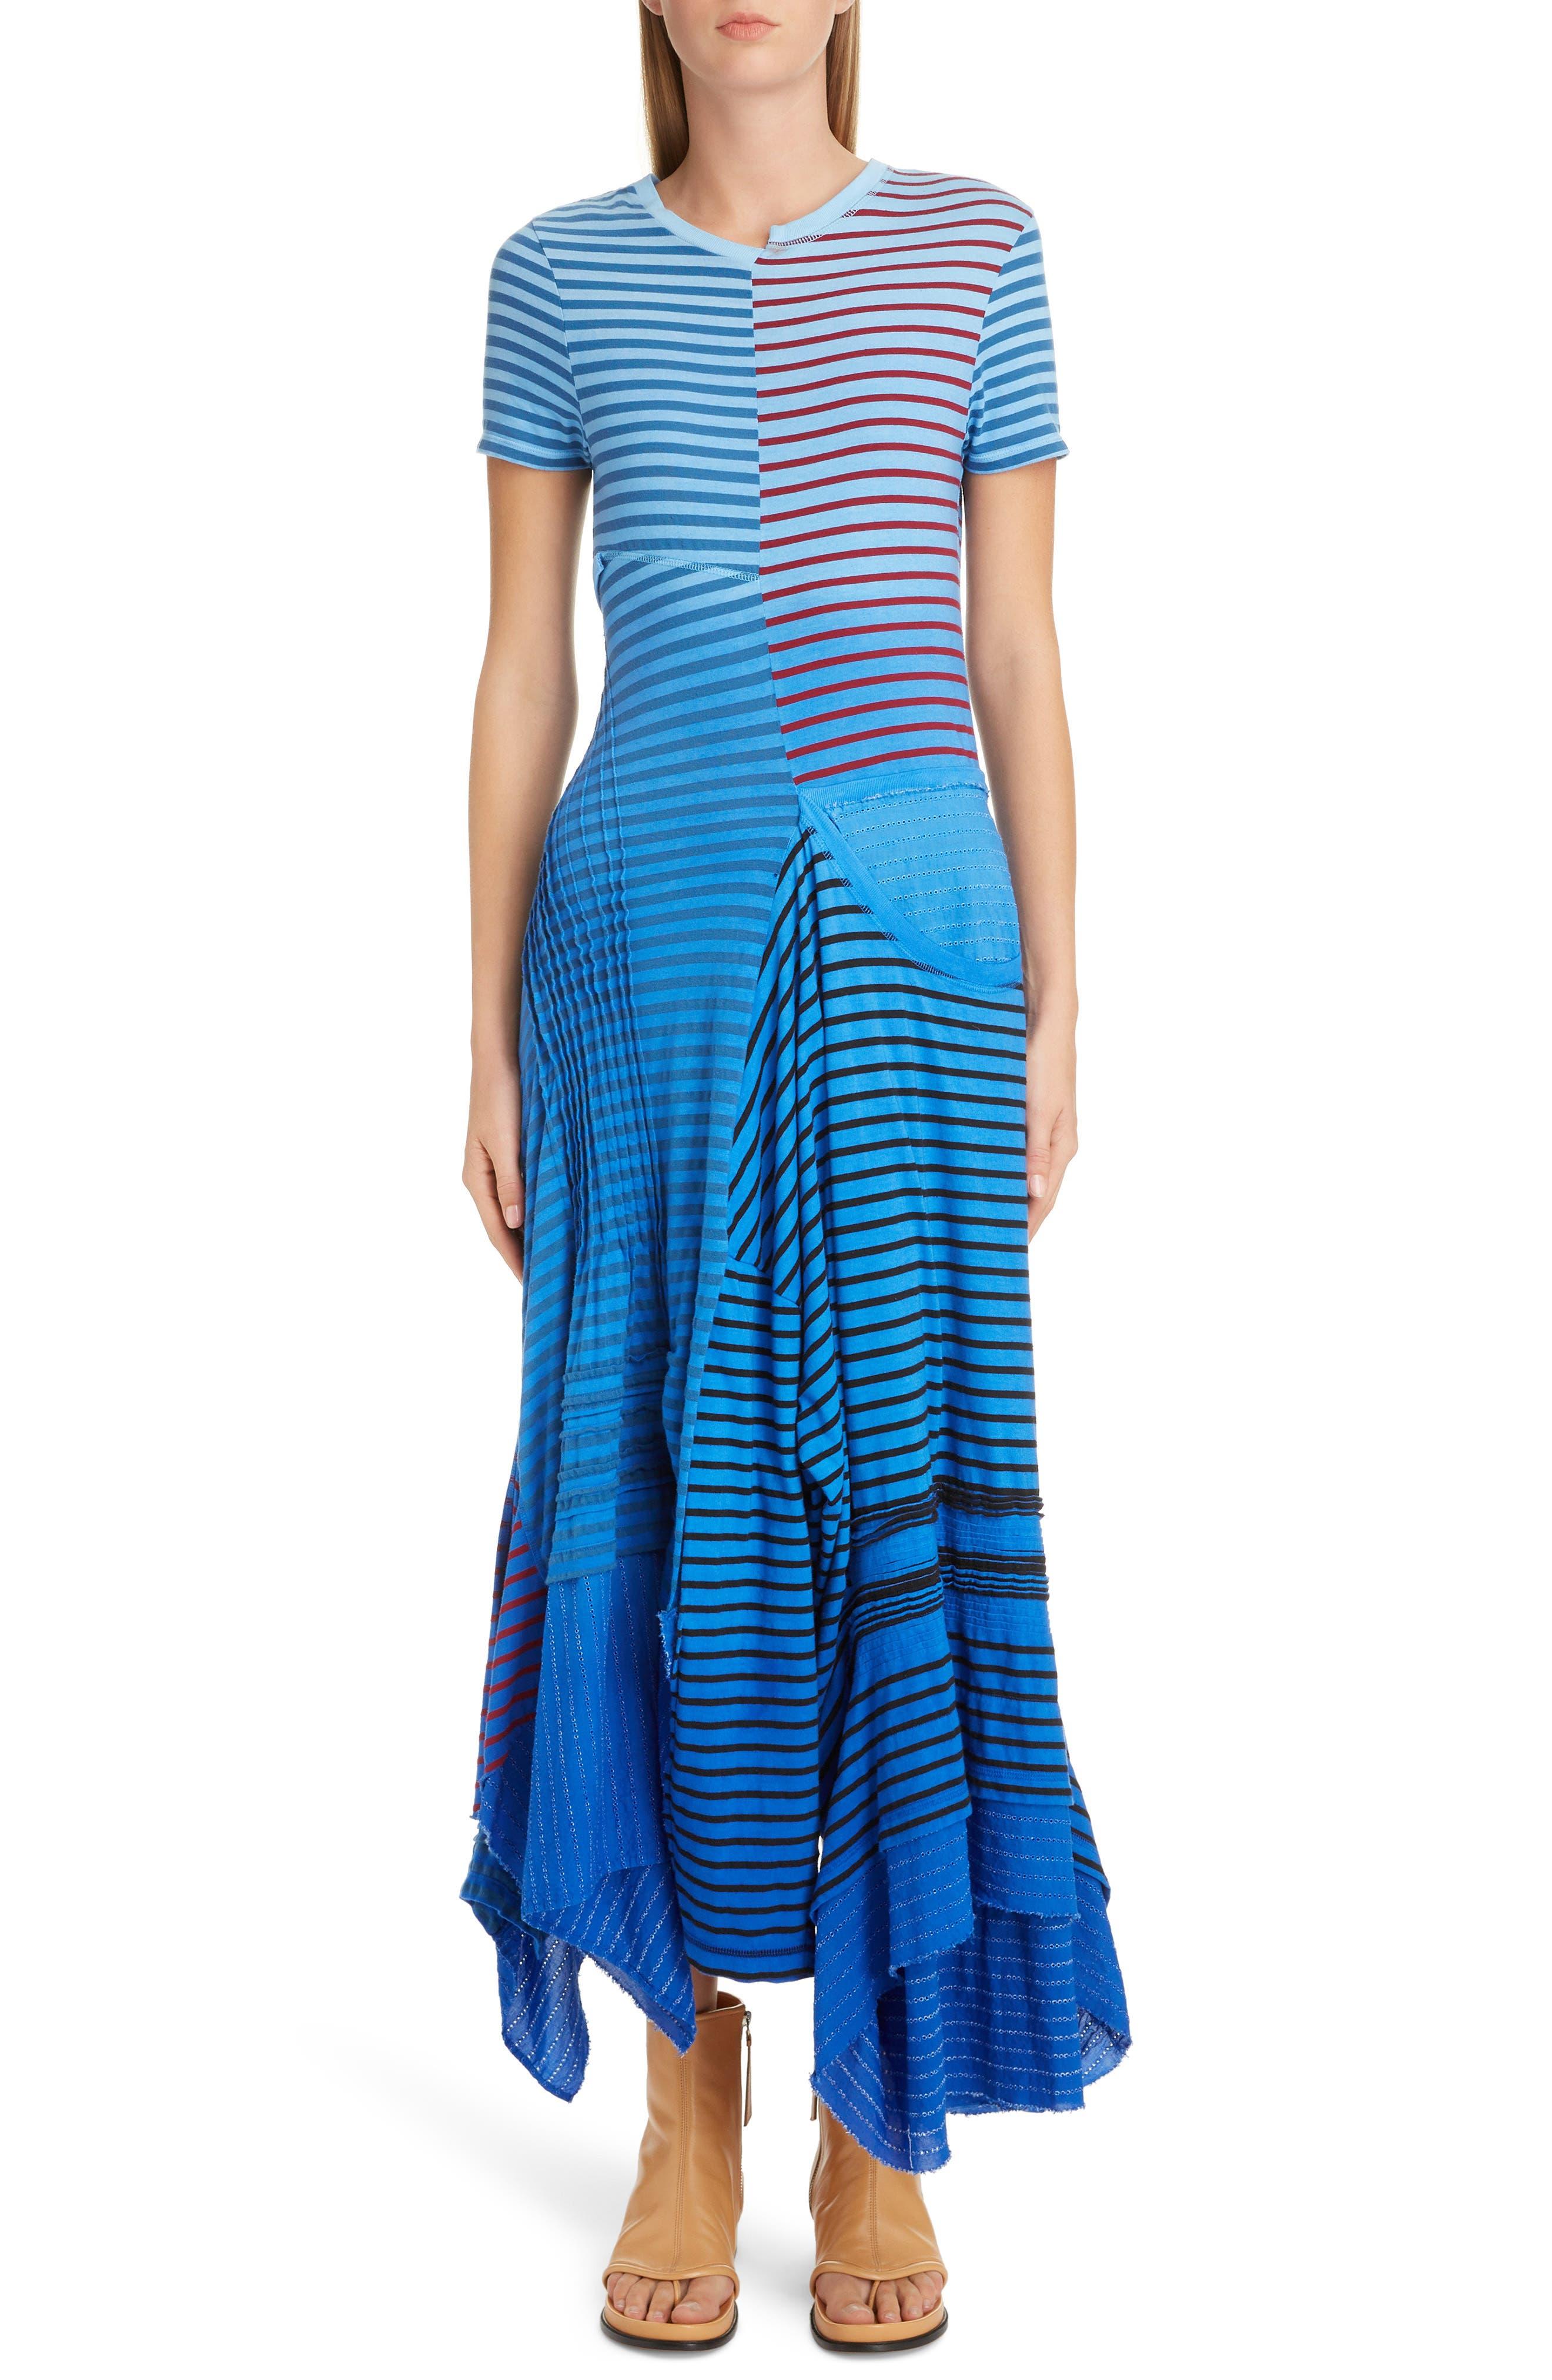 LOEWE Stripe Tie Dye Asymmetrical Dress, Main, color, 5100 BLUE